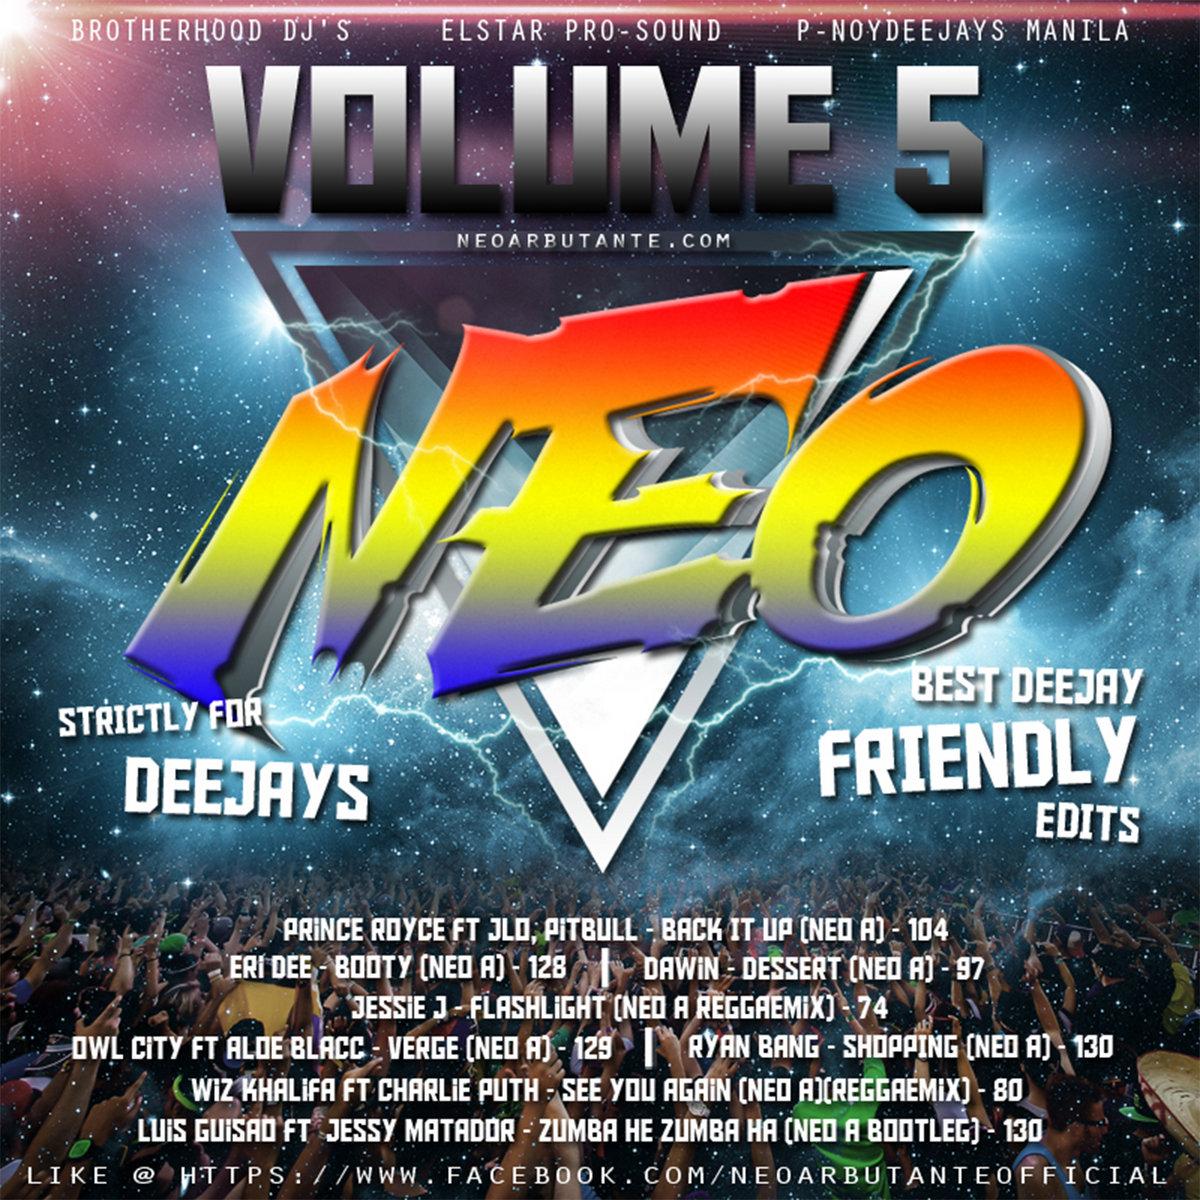 Jessie J - Flashlight (Neo A Reggaemix) - 74 | DJ NEO